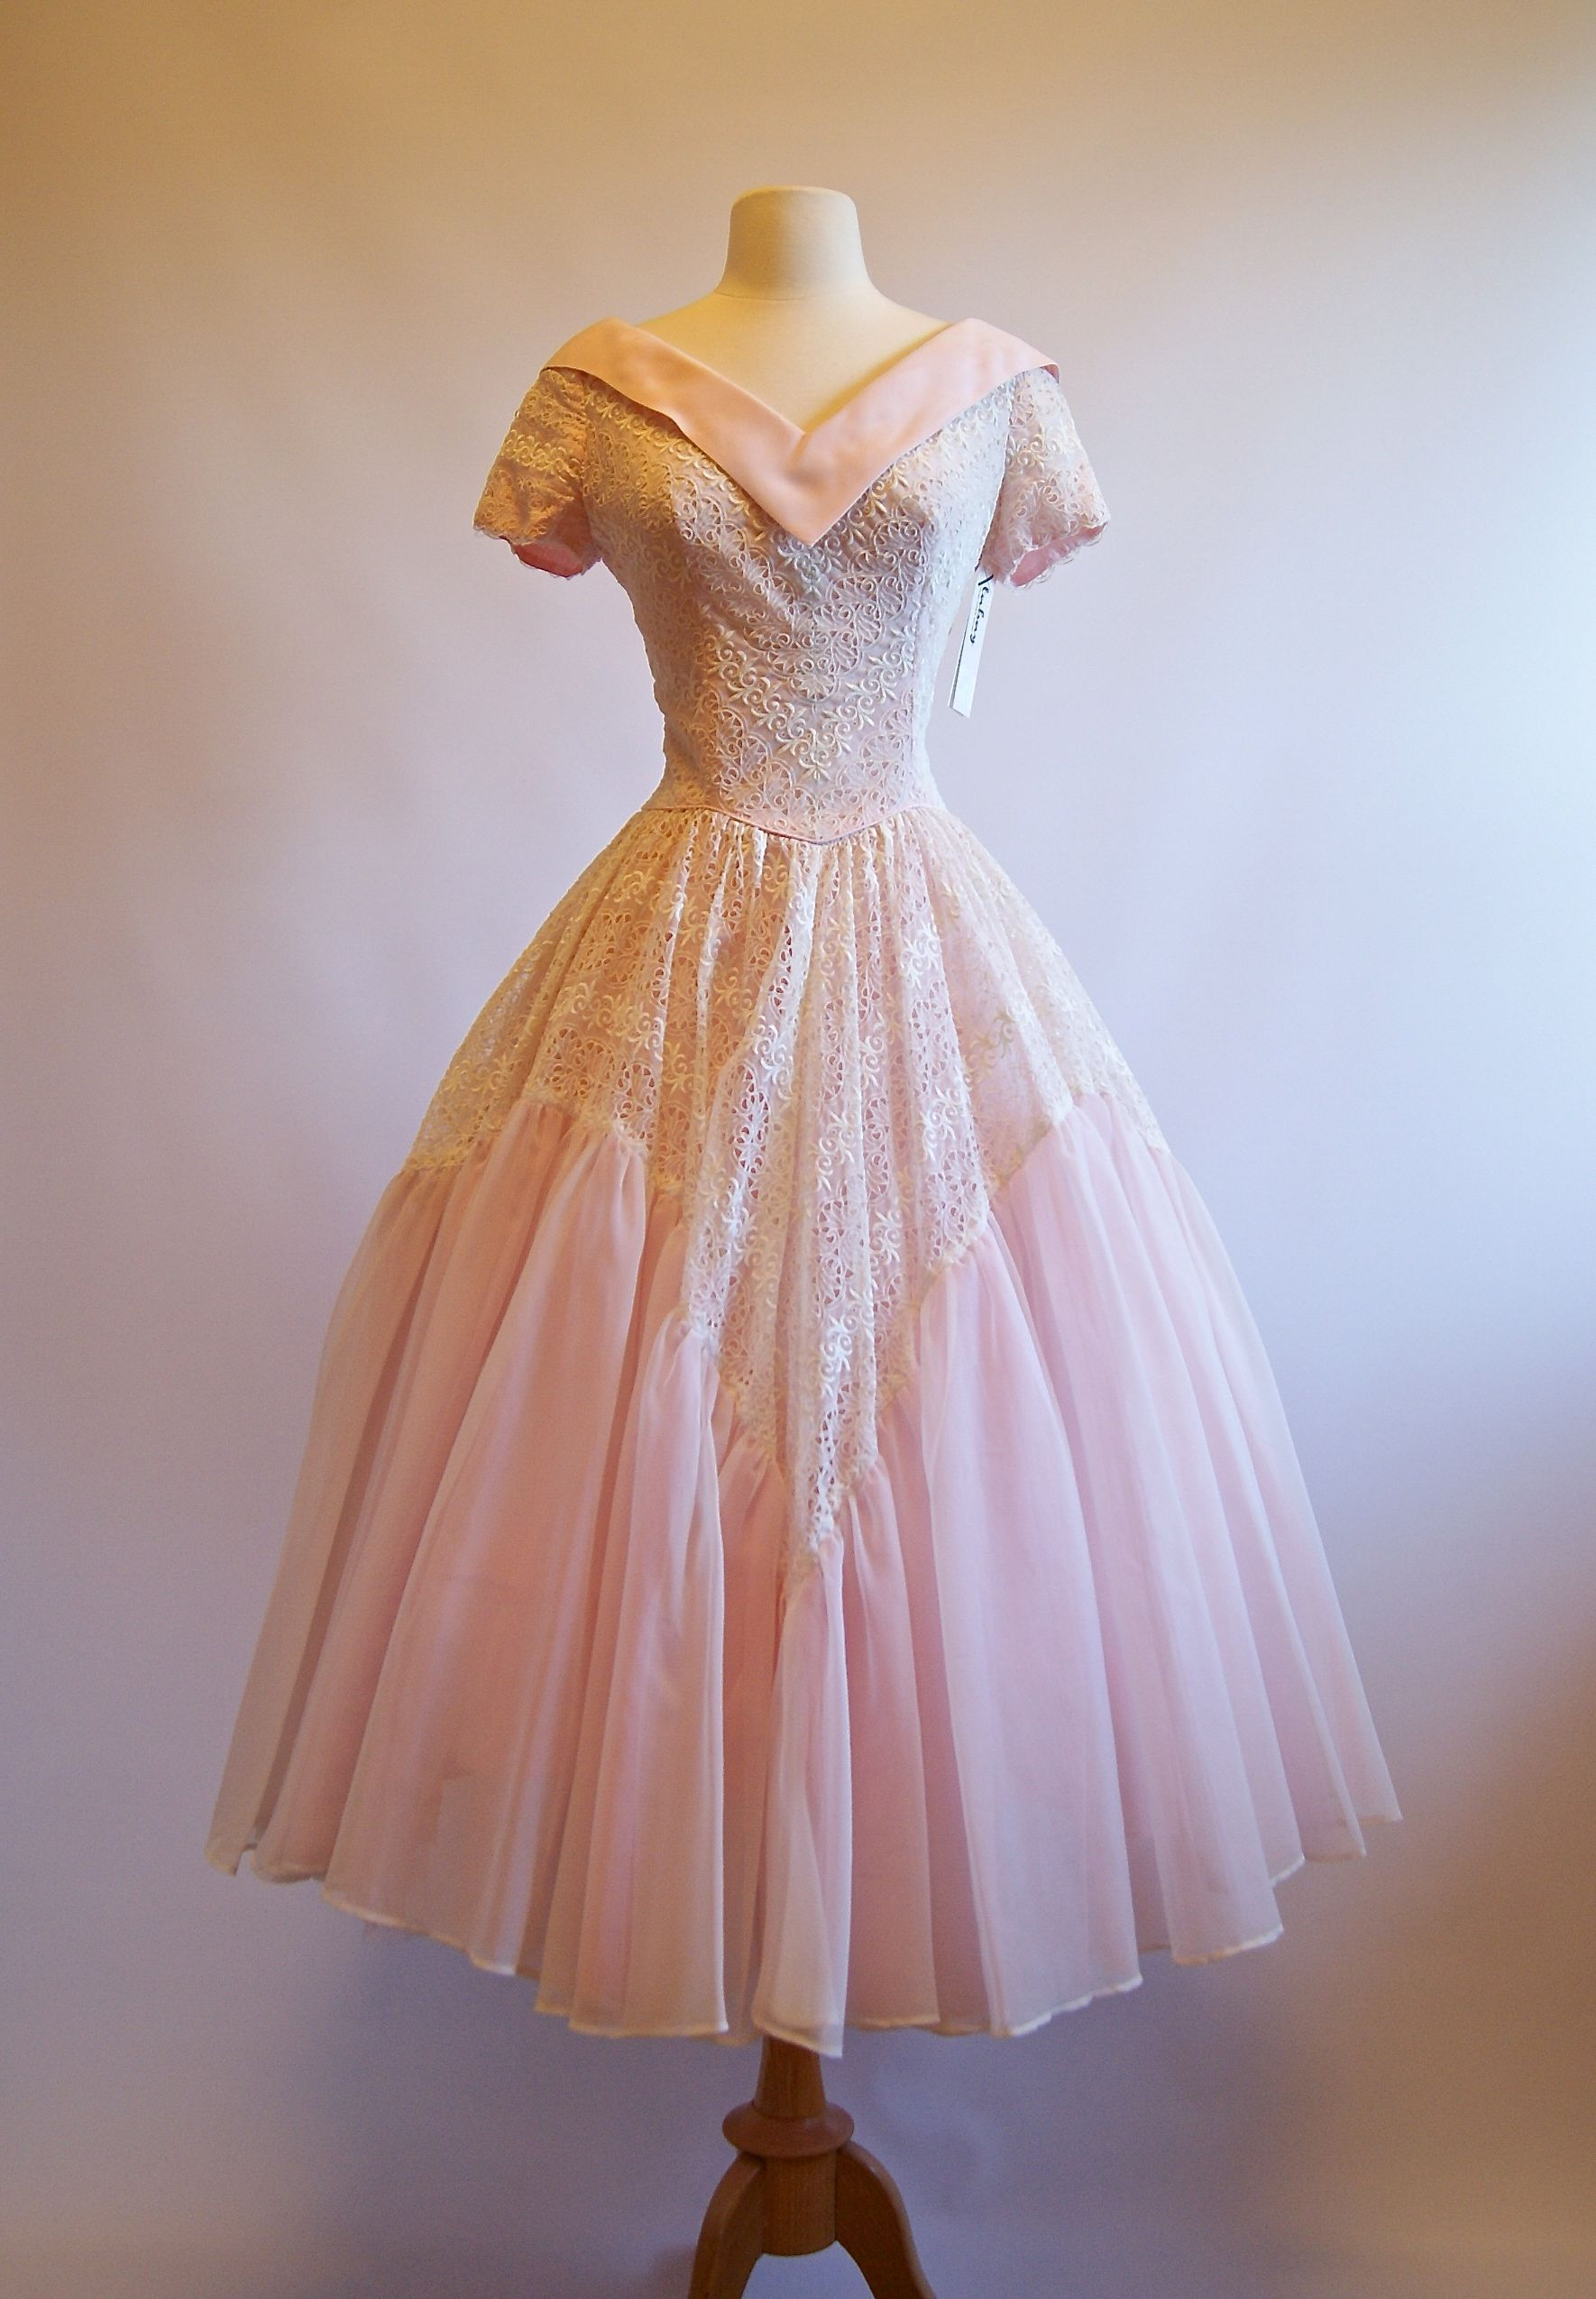 Lace dress 50s  Vintage s Dress  s Dress xtabayvintage  Vintage Dresses